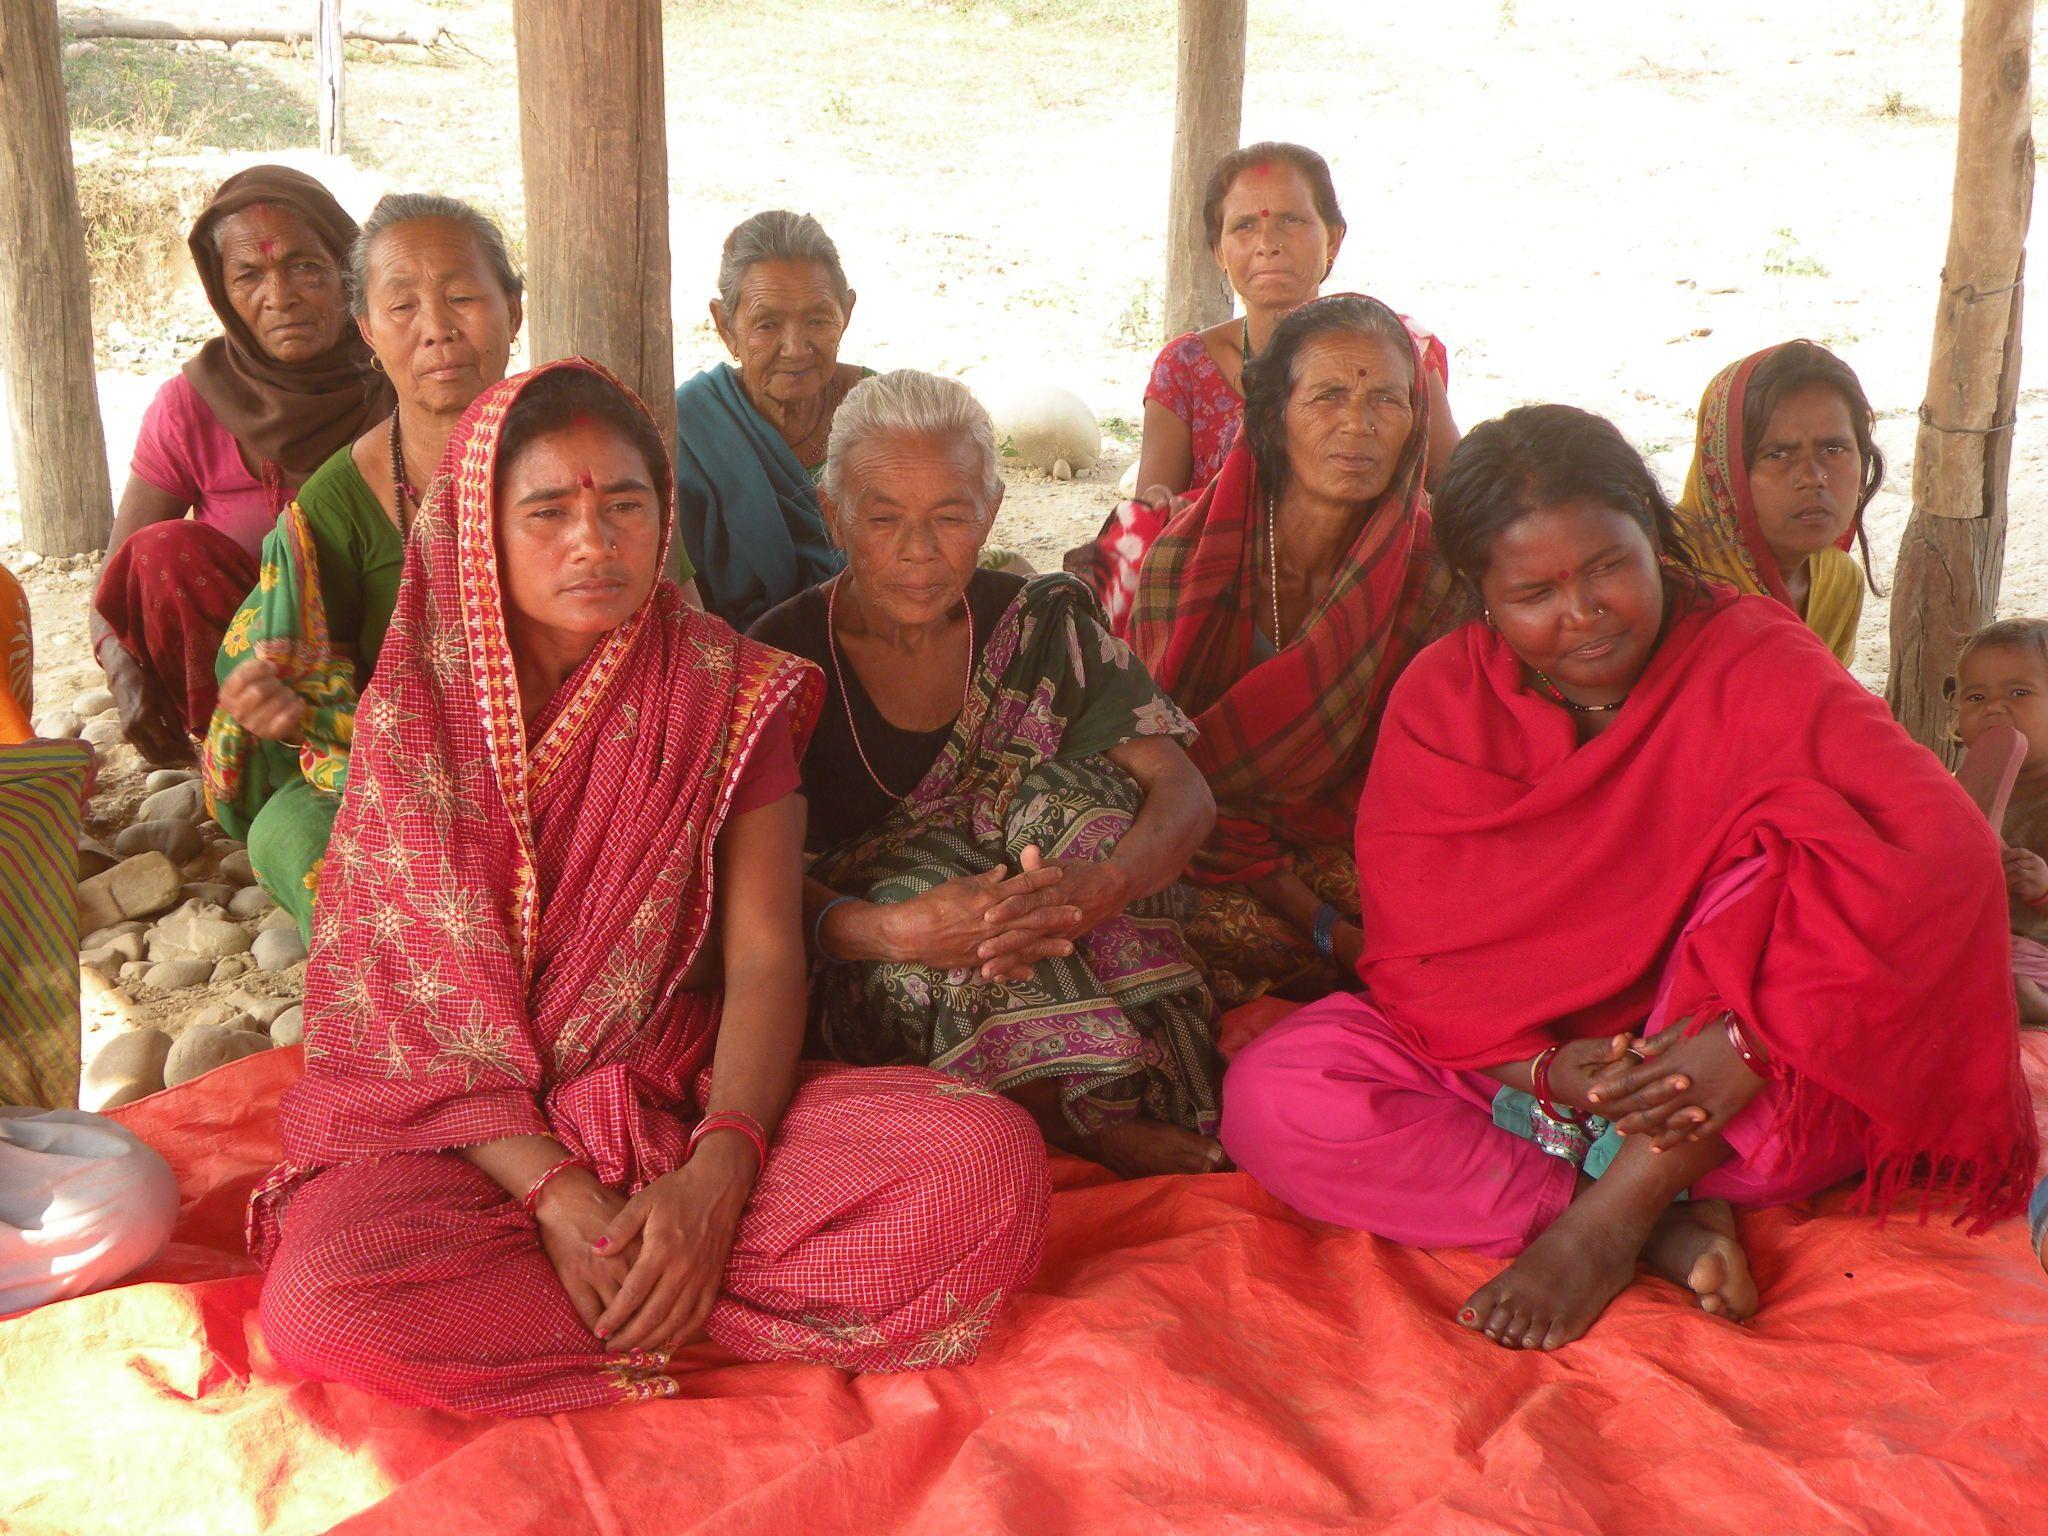 women of nepal - Google Search